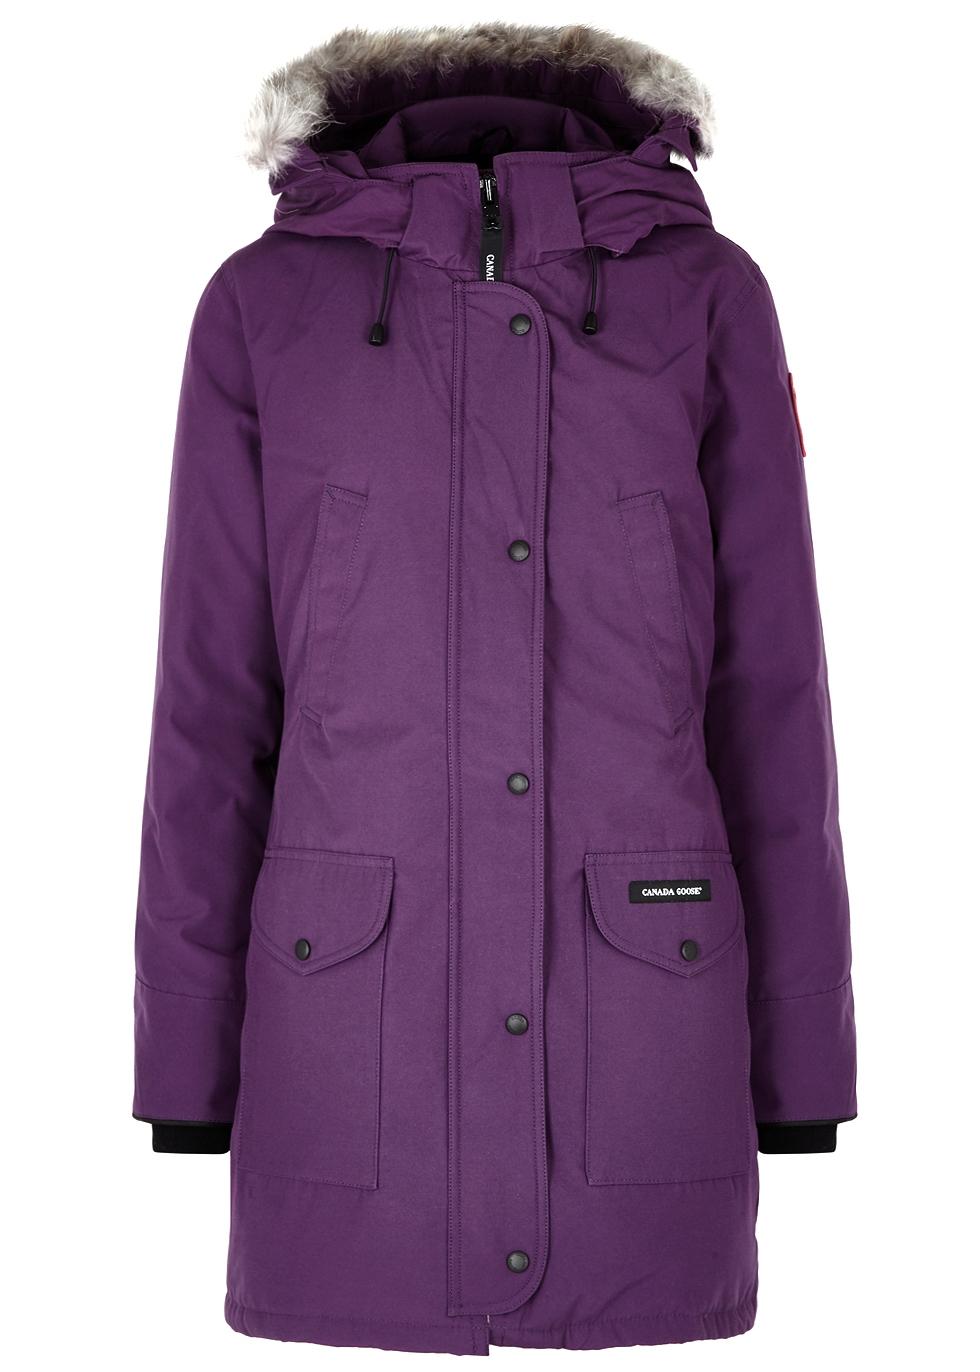 Trillium Purple Fur-Trimmed Parka in Dark Purple